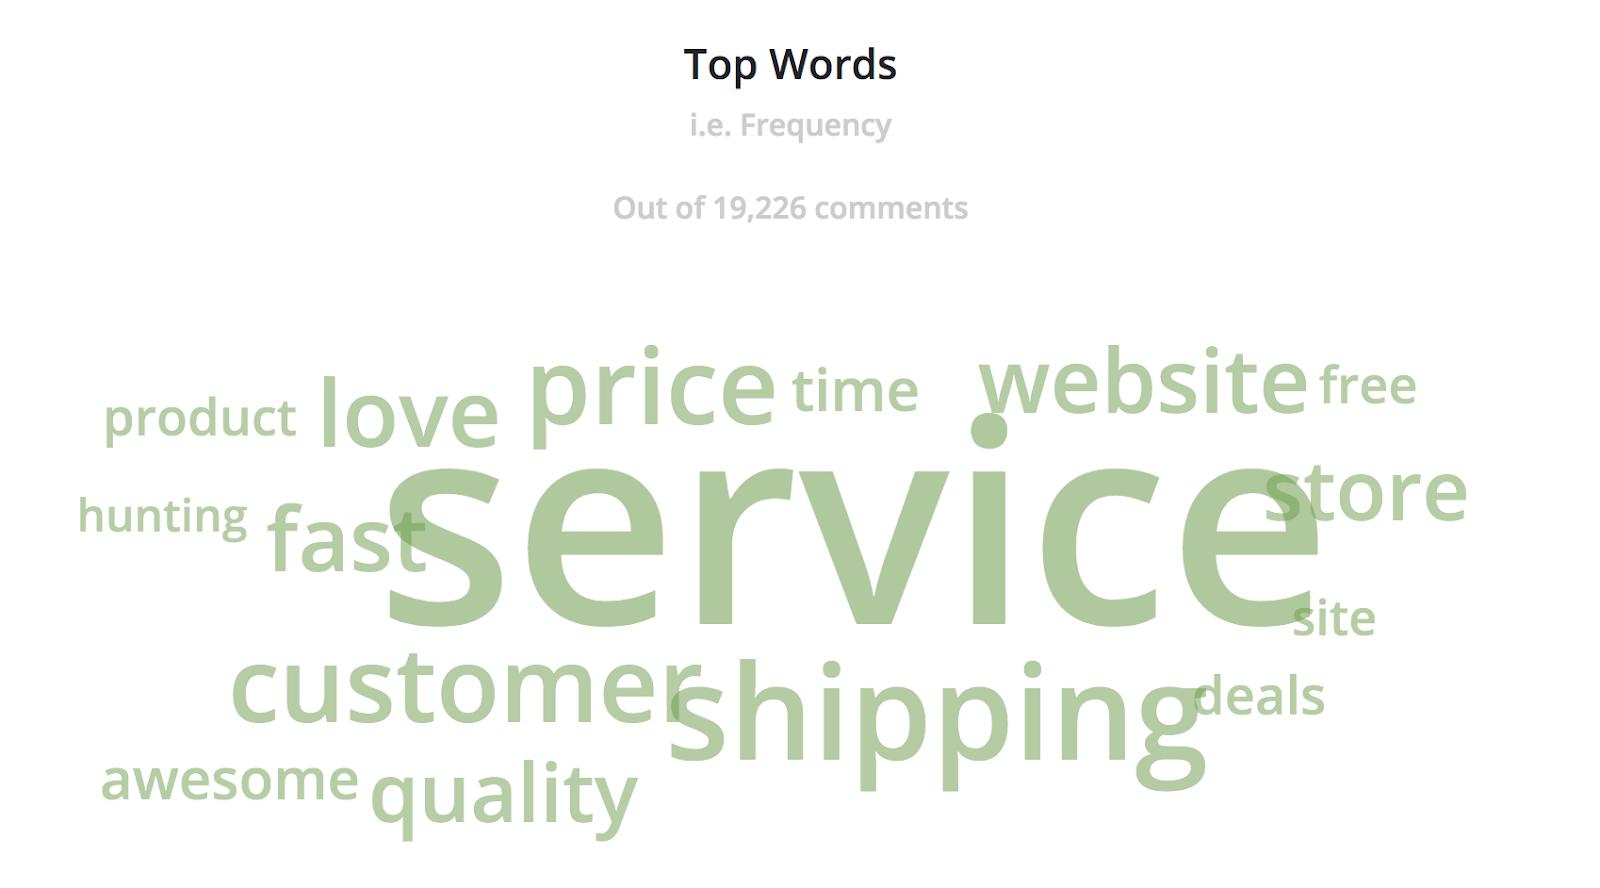 World cloud for customer feedback